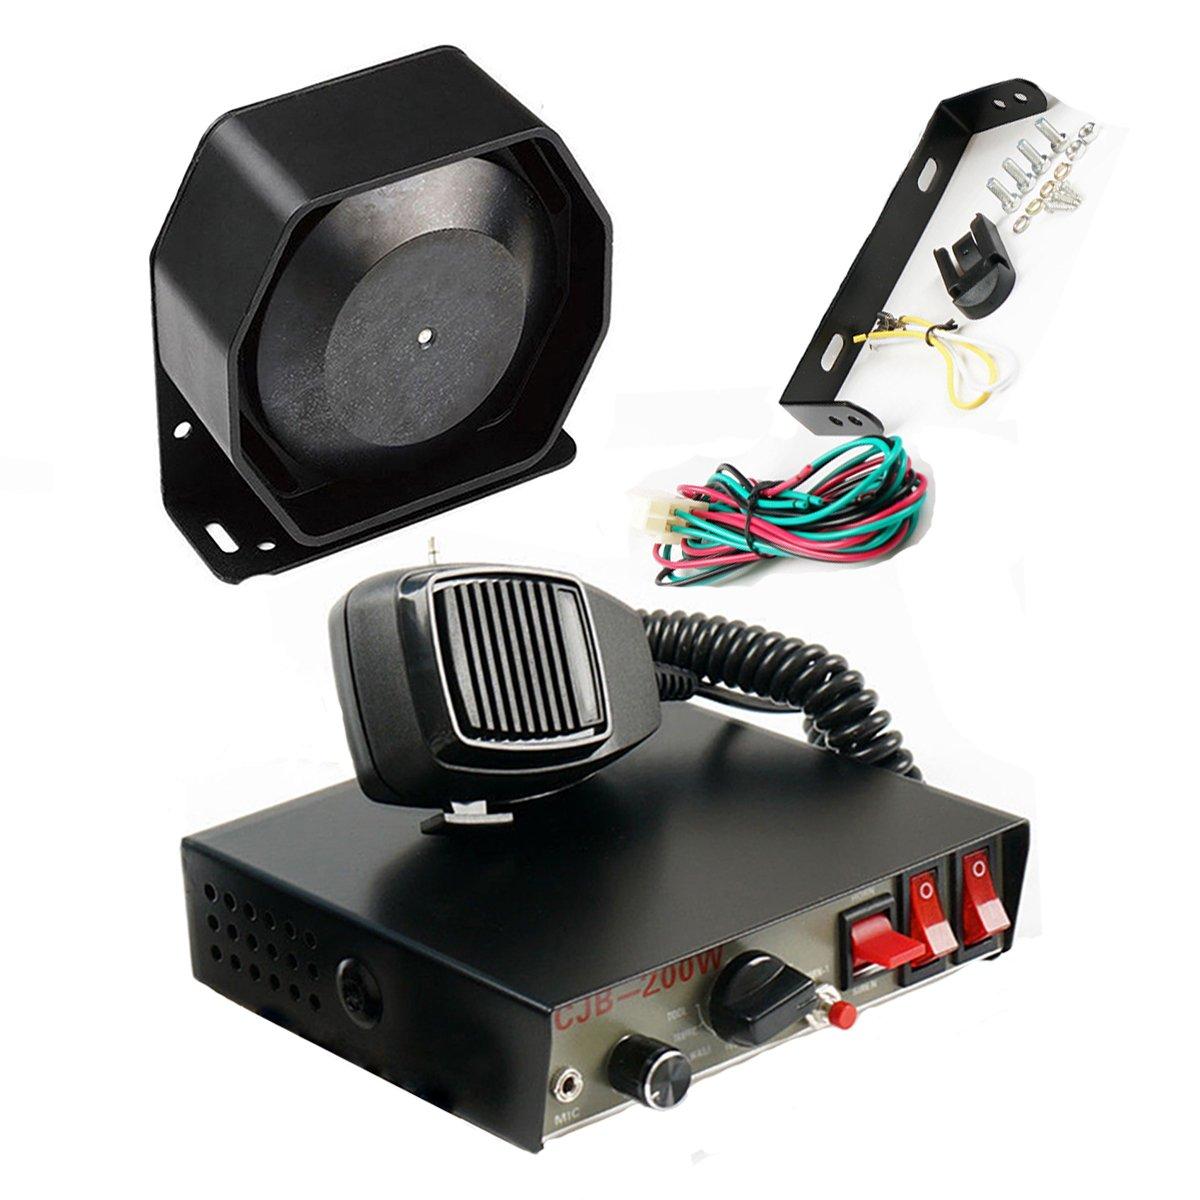 DENG 200W 8Sound Loud Car Warning Alarm Police Fire Siren Horn PA Speaker CJB by DENG (Image #1)